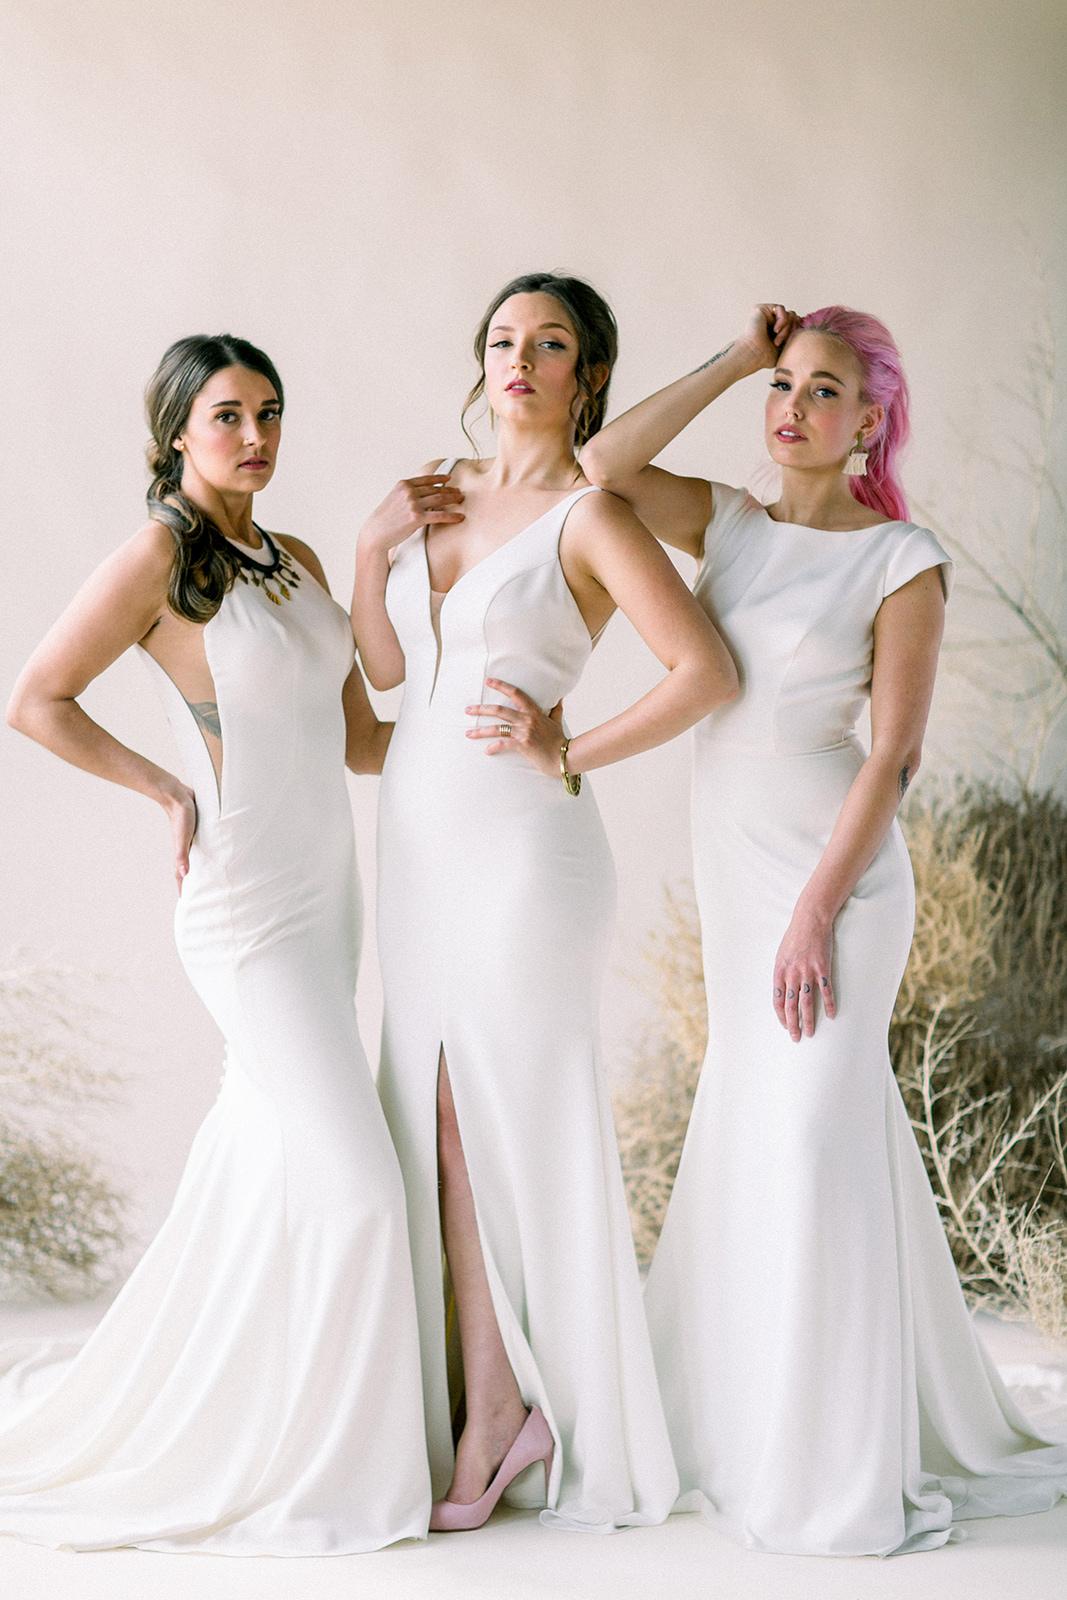 Desert Wedding | Modern Wedding | Minimal Wedding | Same Sex Wedding | Niki Rhodes Photo | Joy Wed | Canadian Wedding Blog | Fine Art Wedding Blog | Stacey Foley Design